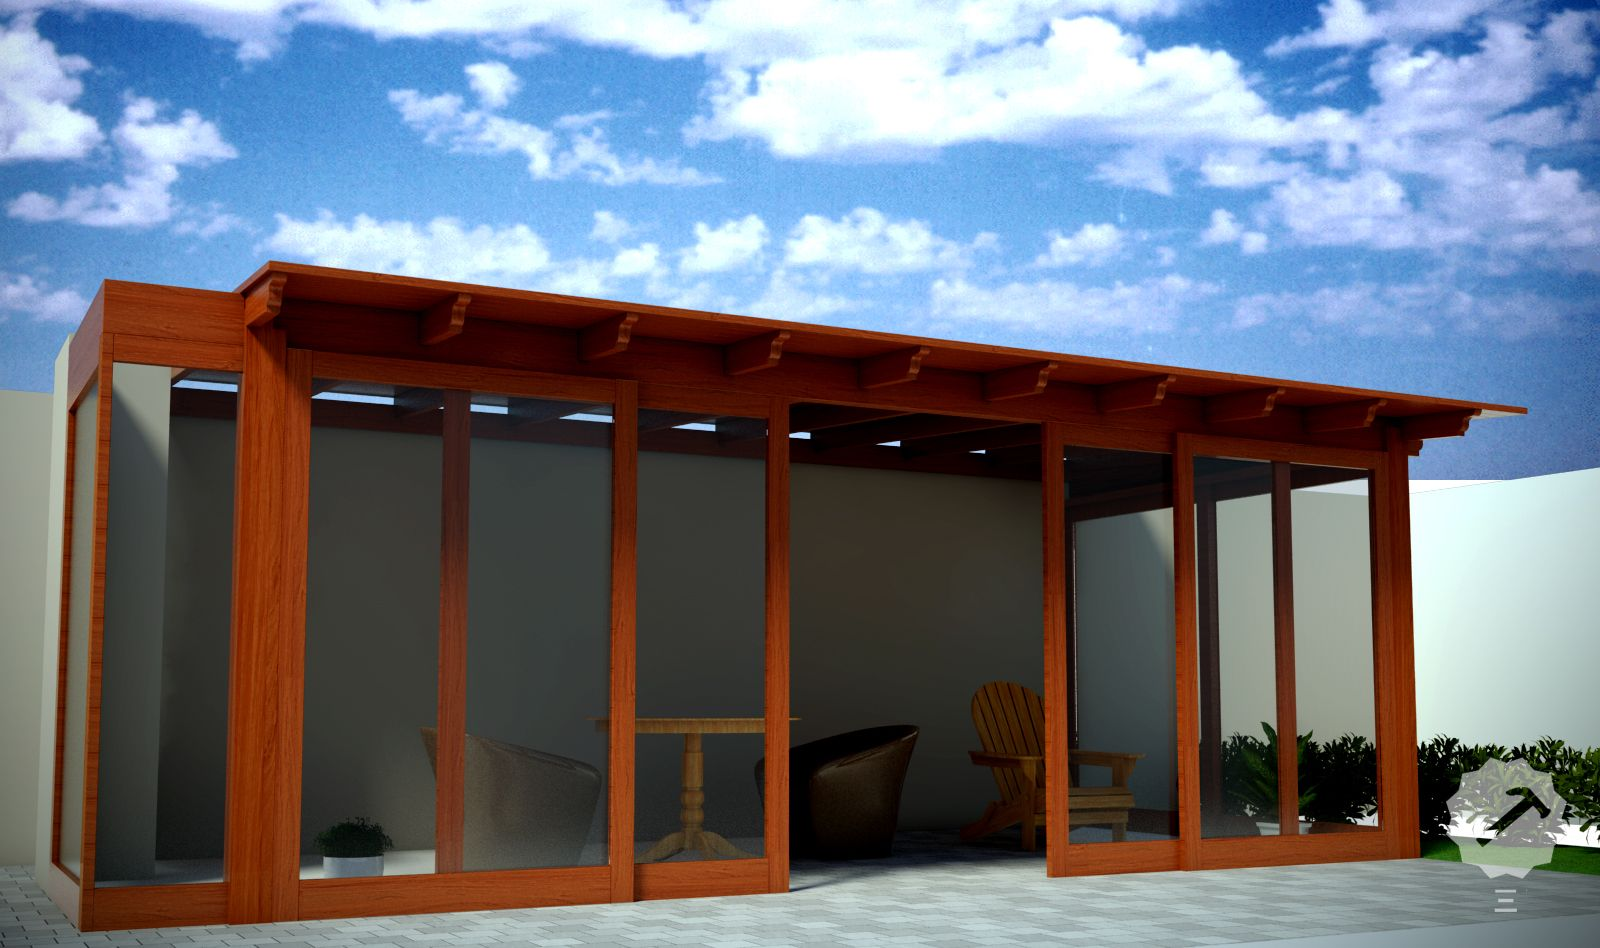 Techo terraza m s mamparas de vidrio con marco de madera for Cerradura para mampara de vidrio